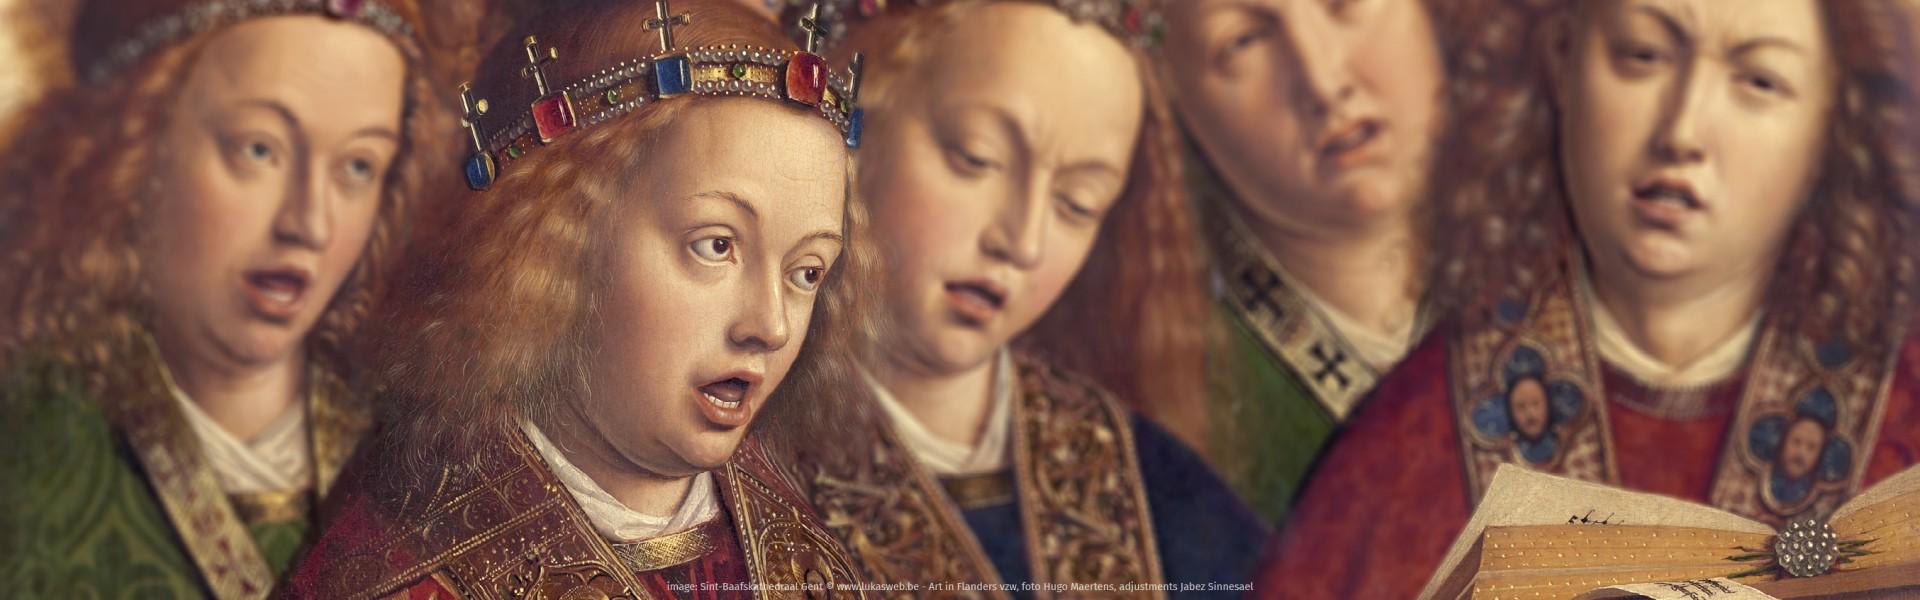 OMG! Van Eyck was here © OMG! Van Eyck was here